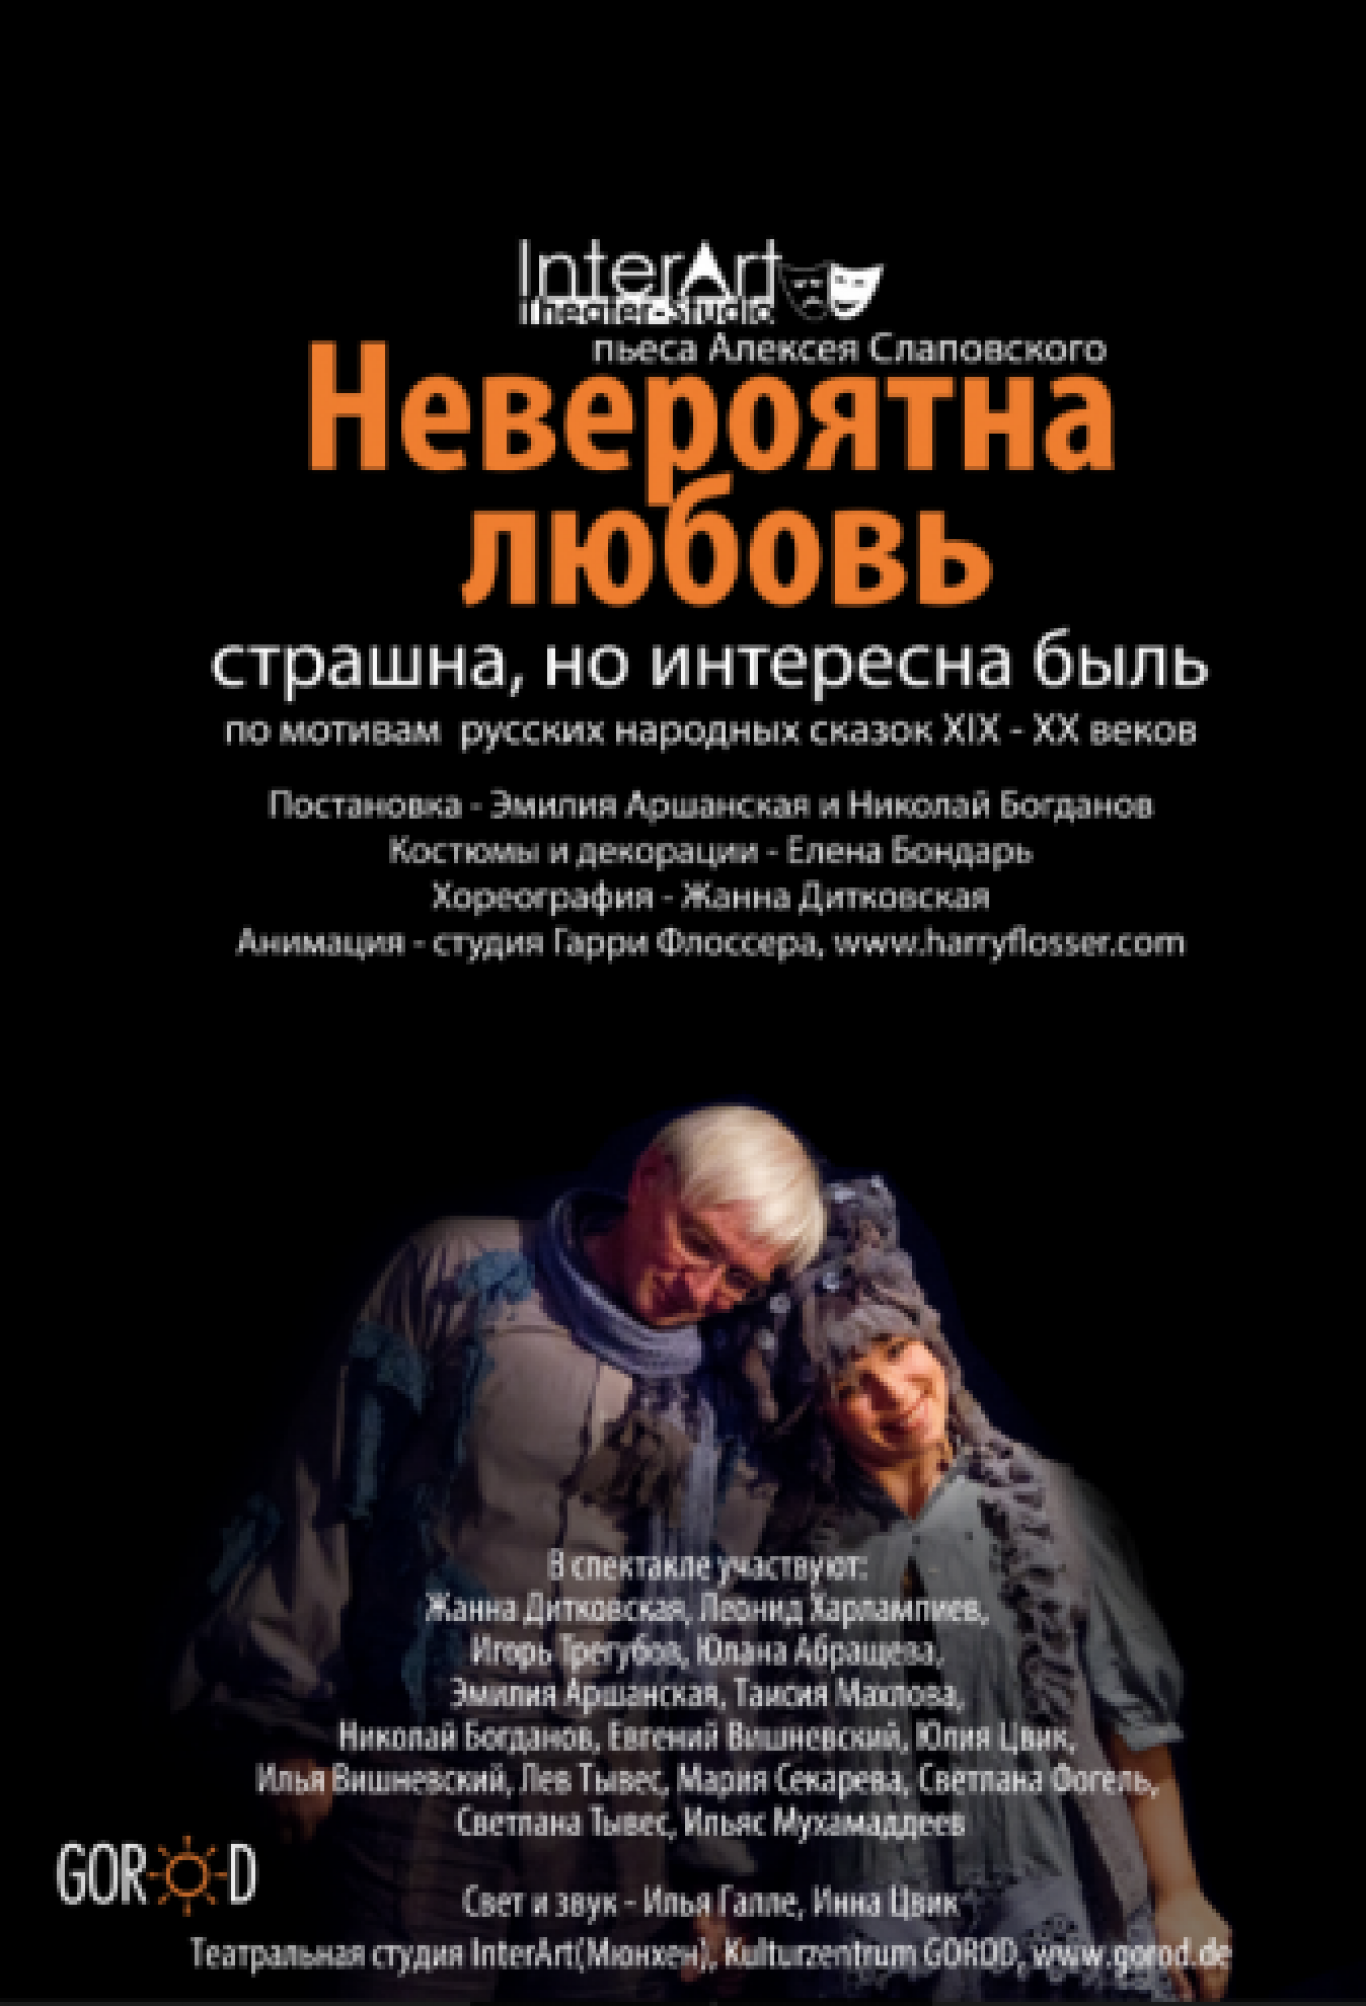 Мюнхенськый театр InterArt на ВДНГ